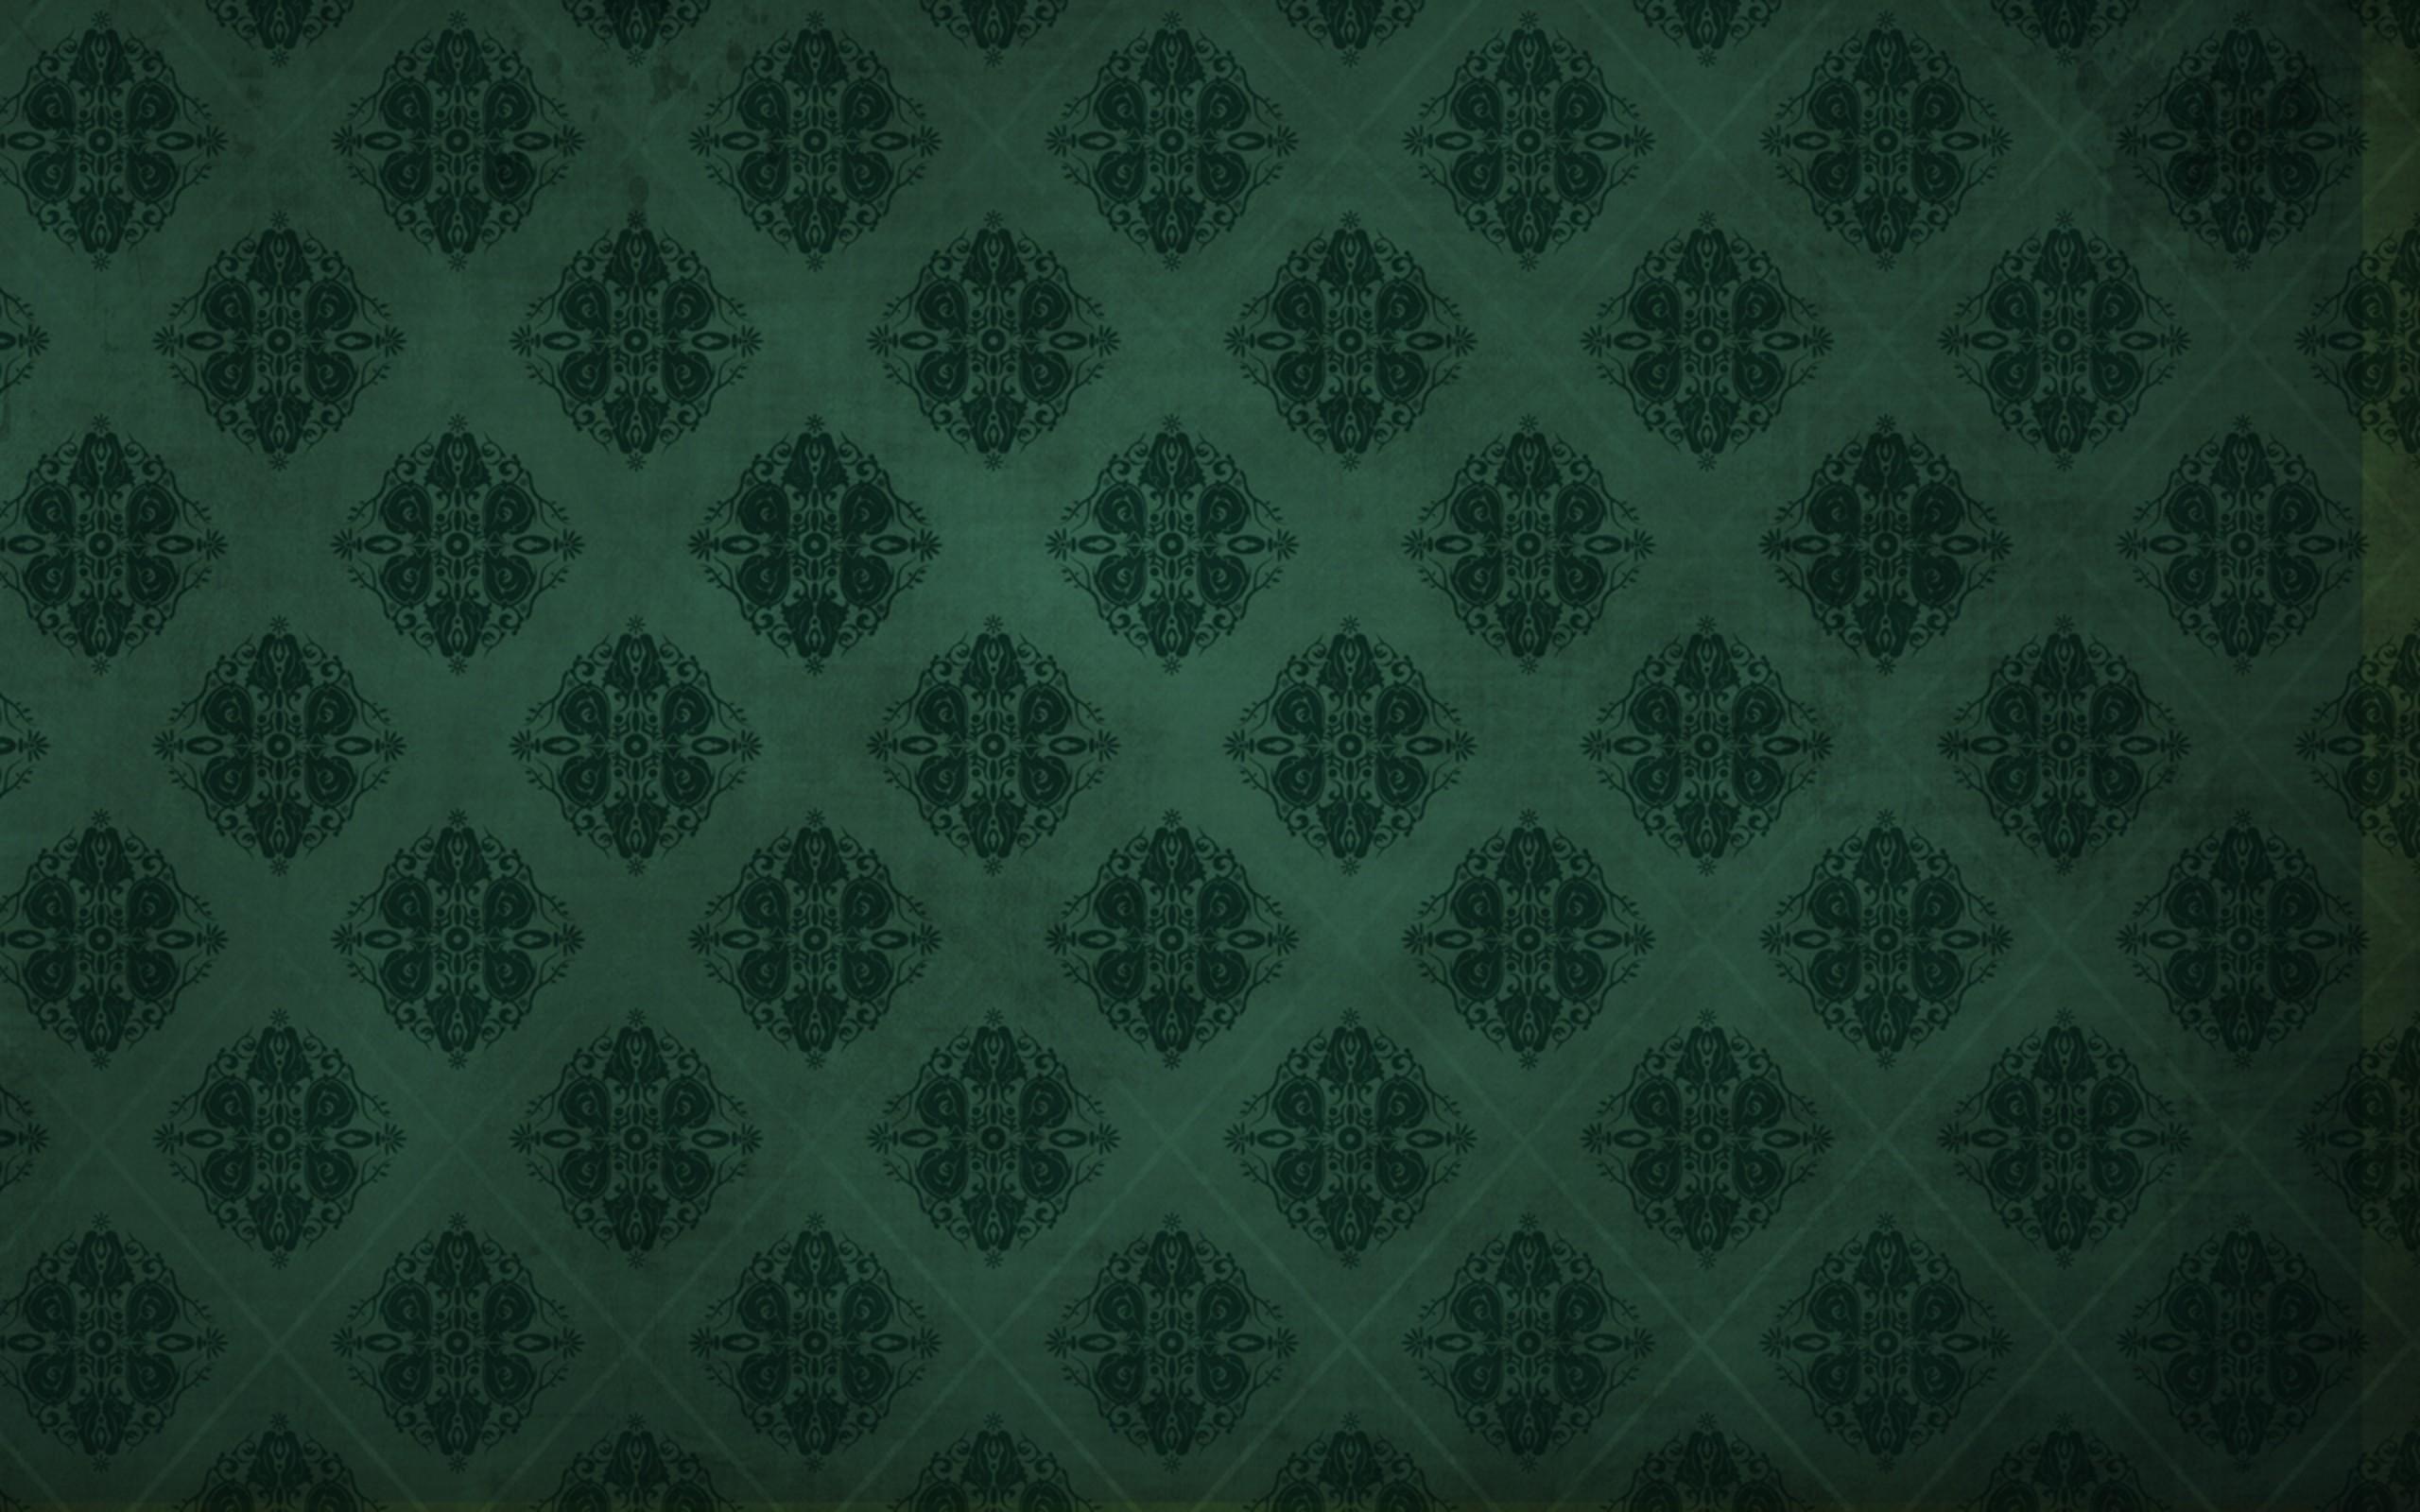 1920x1080 Vintage Flower Background HD Wallpaper Of